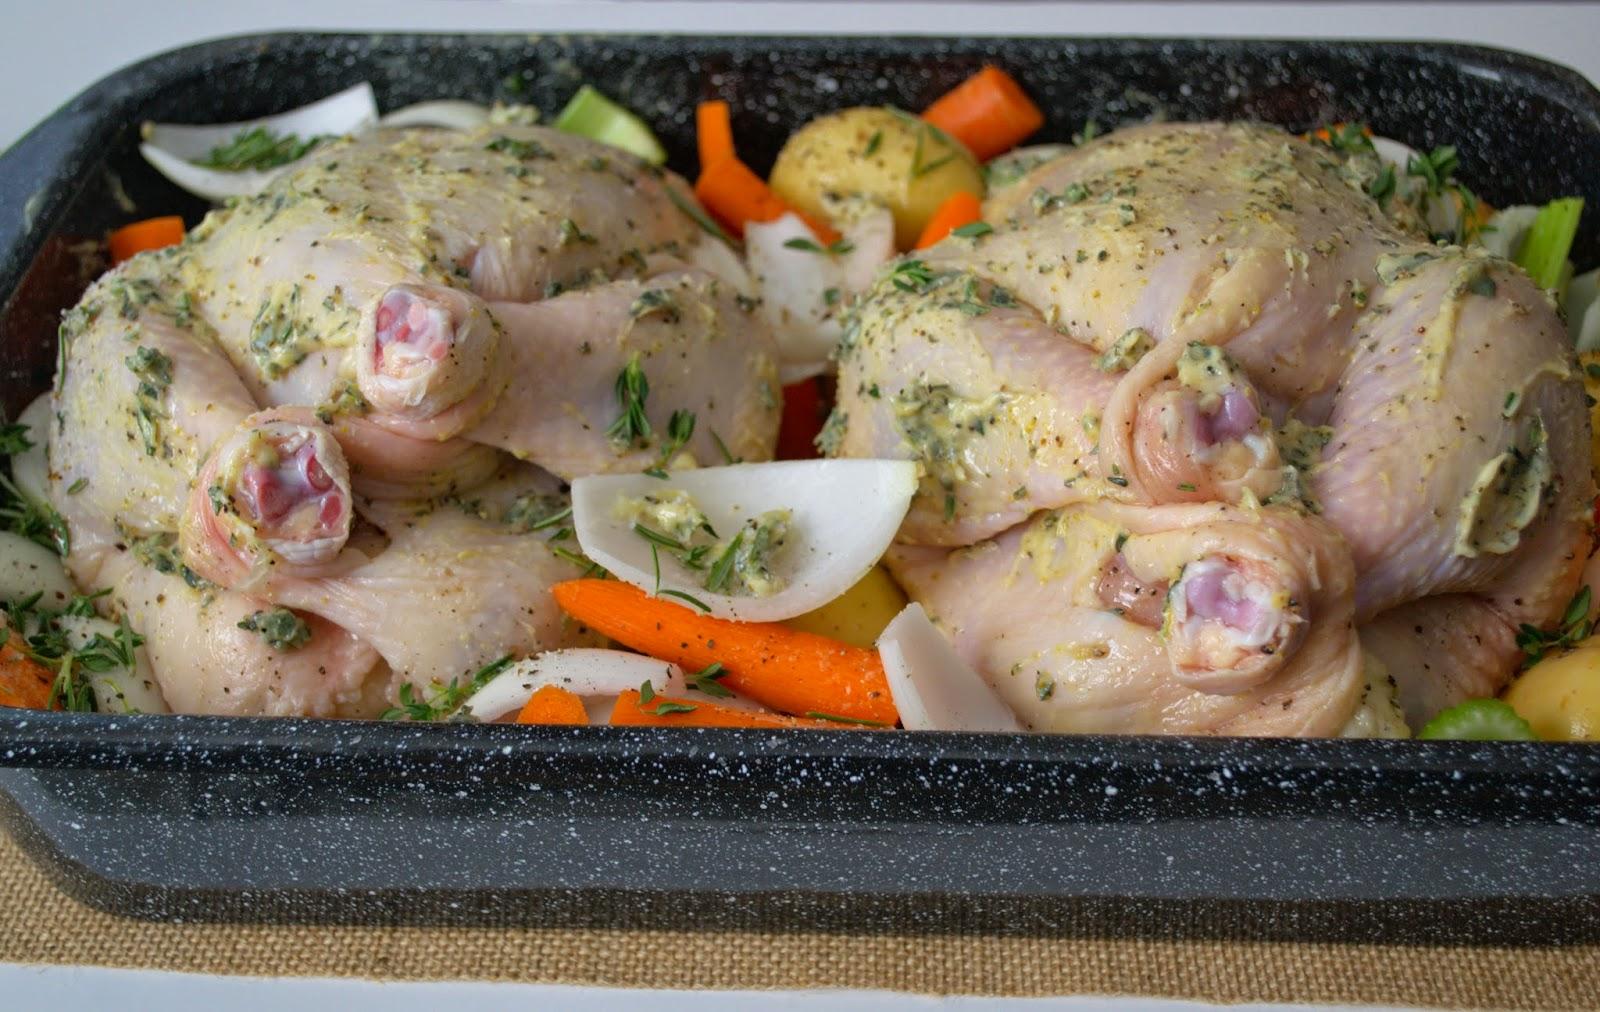 Lemon and Rosemary roasted chicken